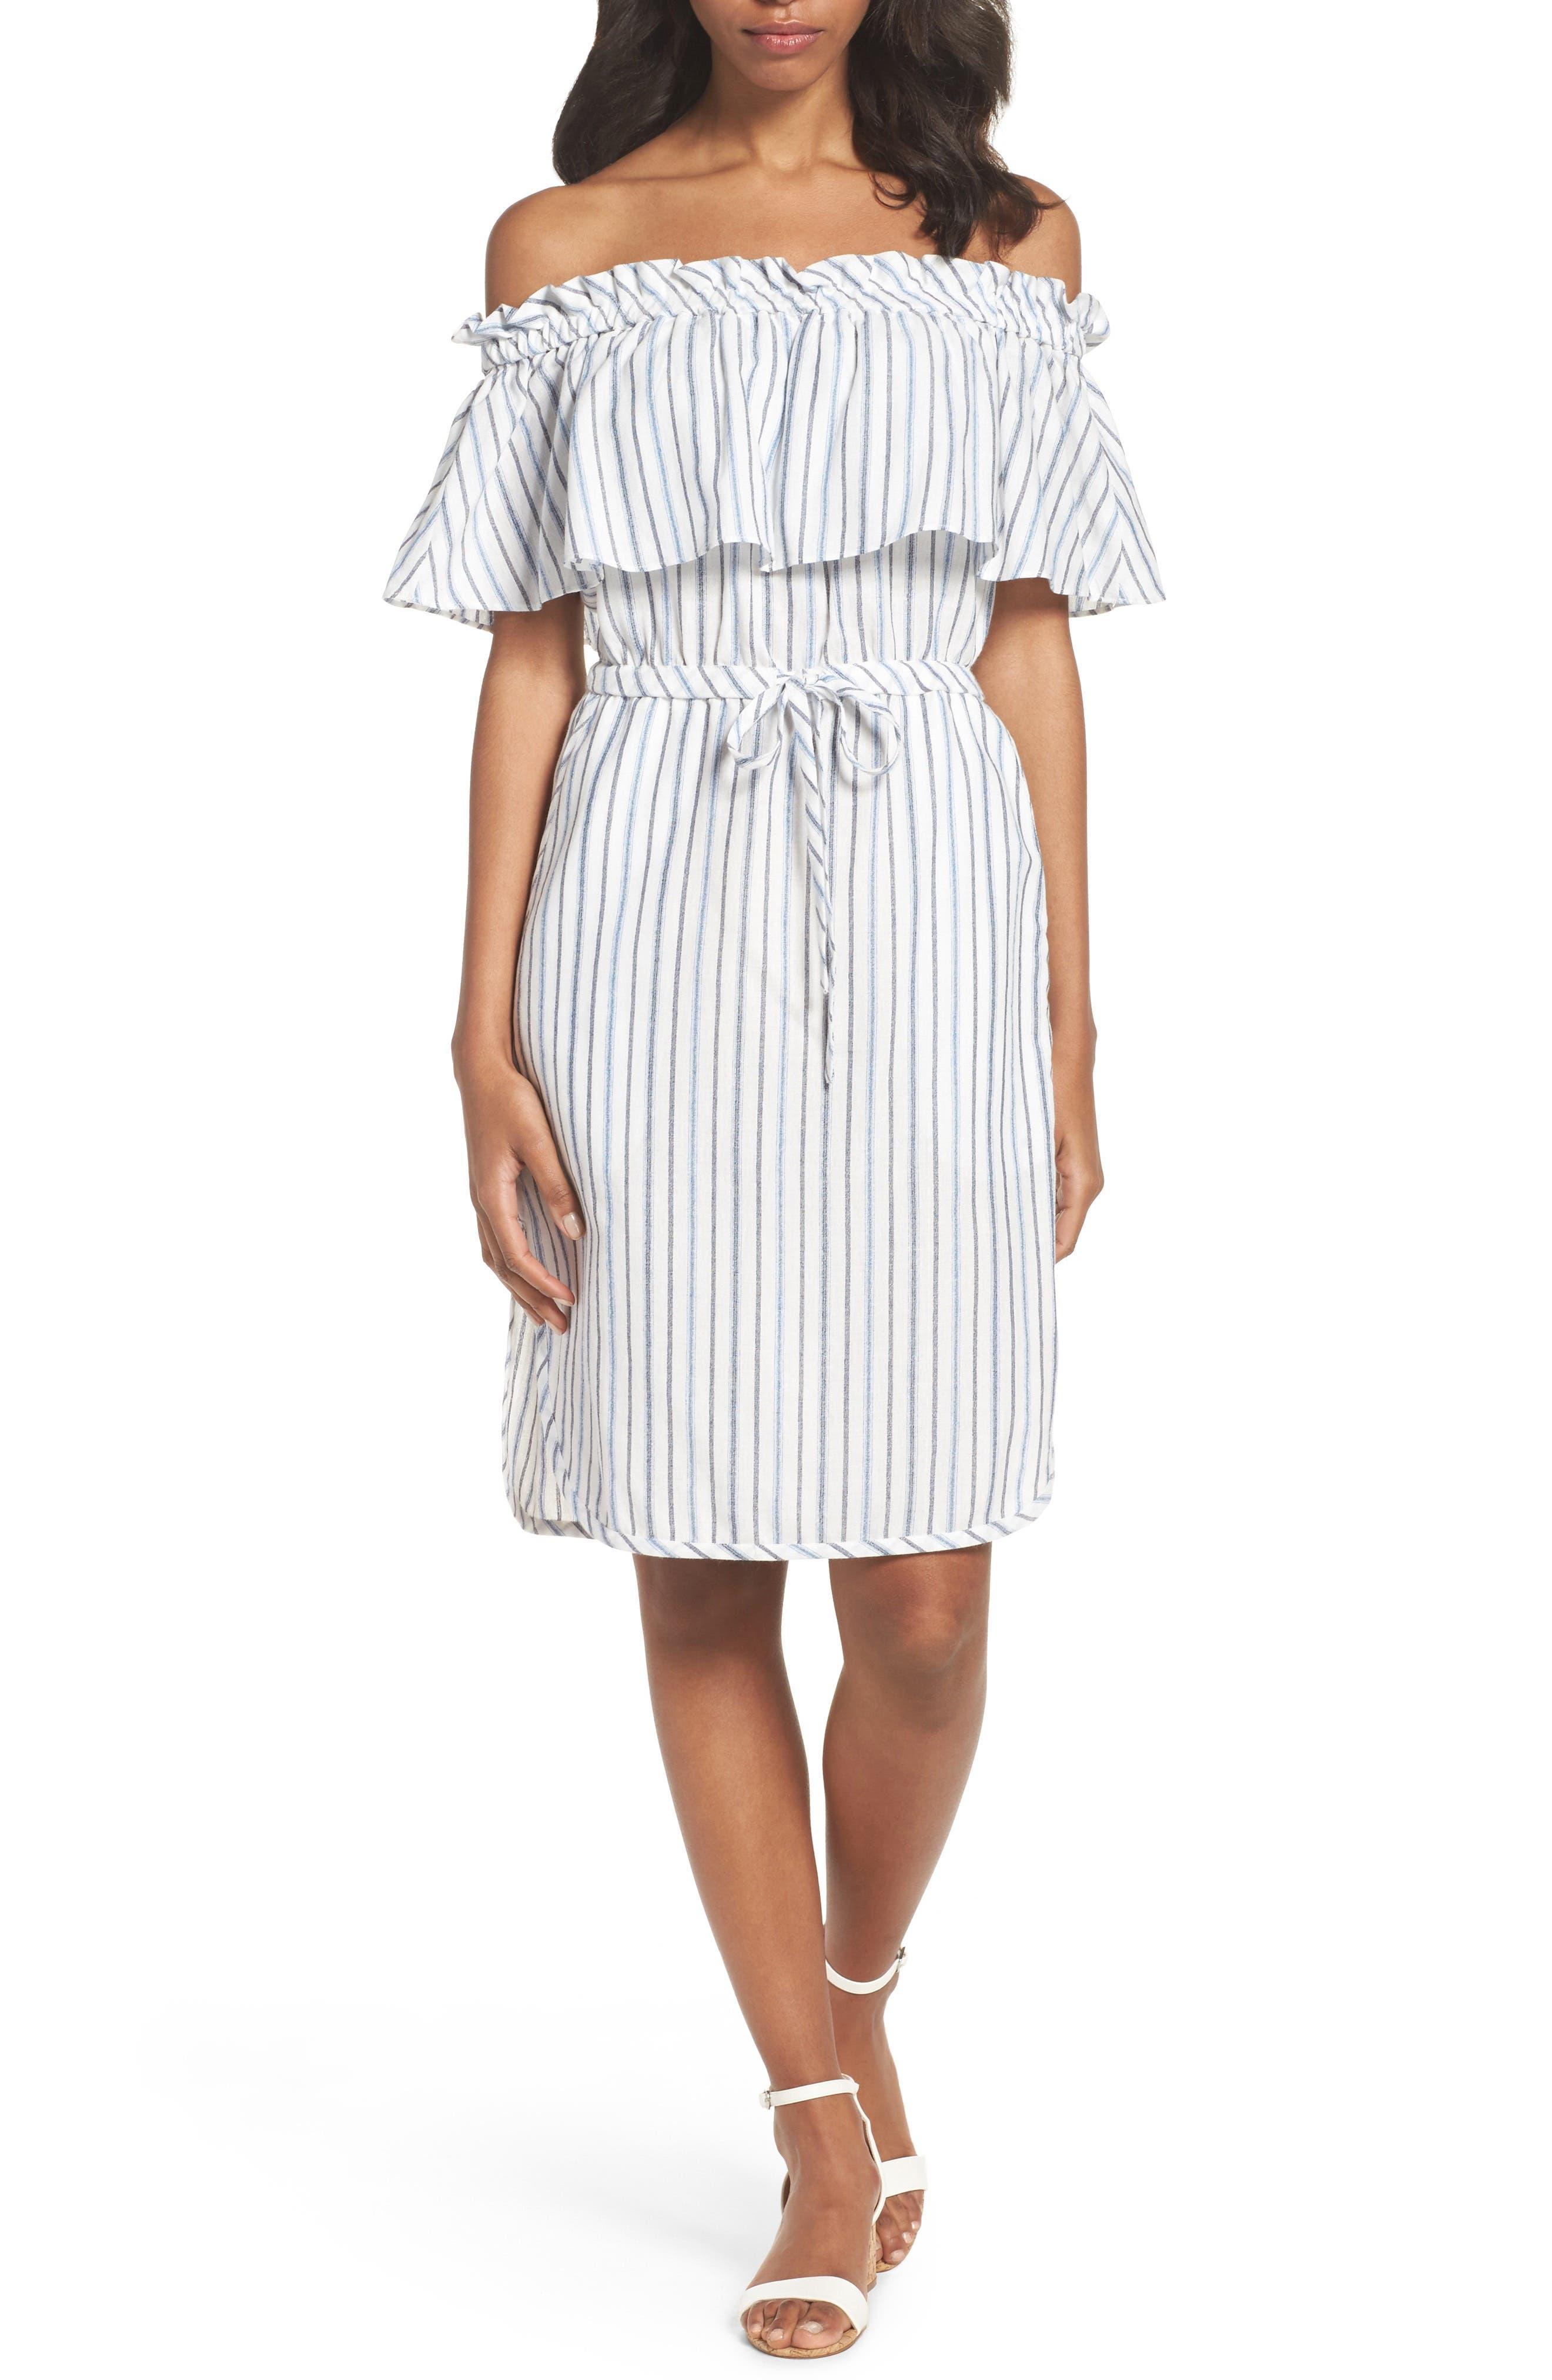 Alexis Off the Shoulder Dress,                         Main,                         color, White Combo